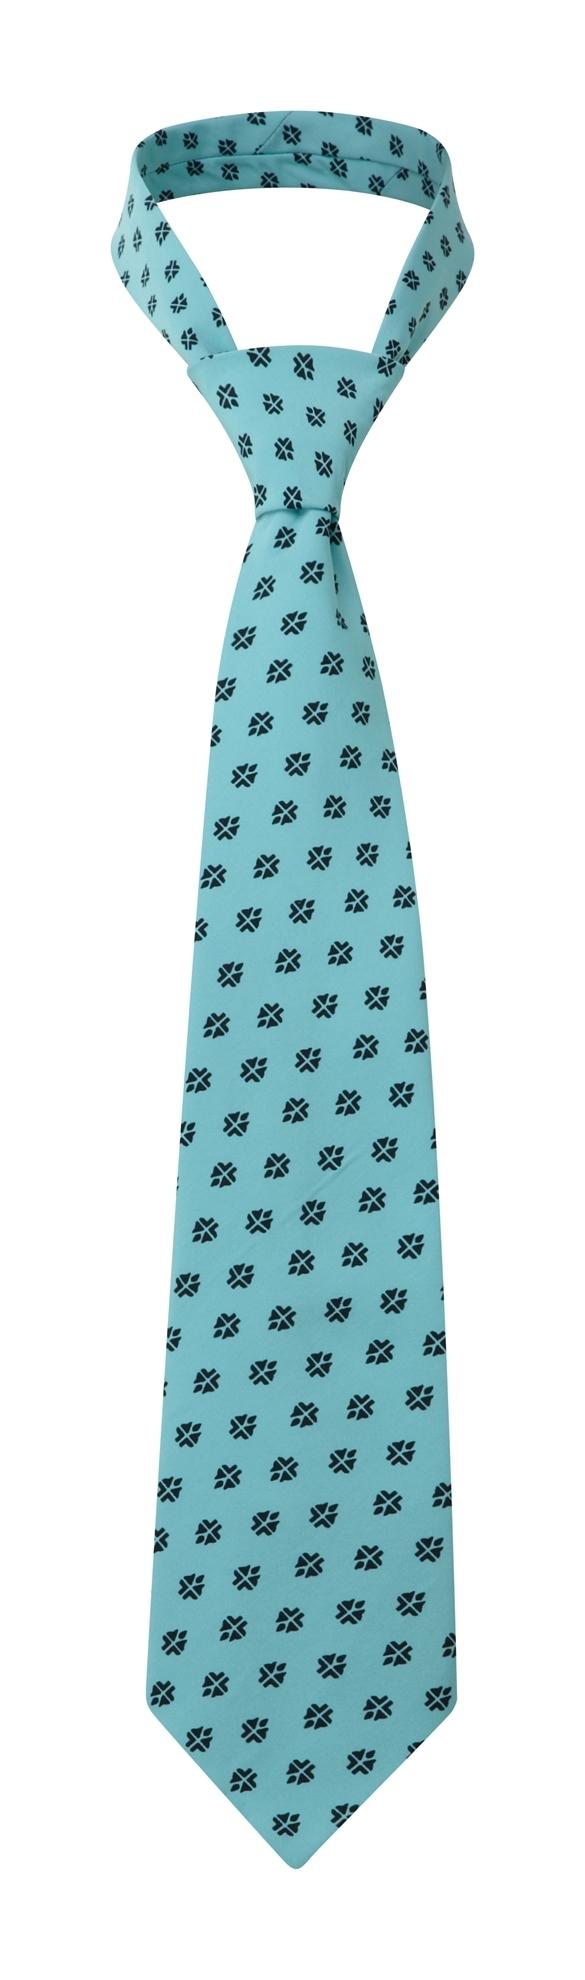 Picture of Print Tie - Light Blue/ Navy Fleur Print